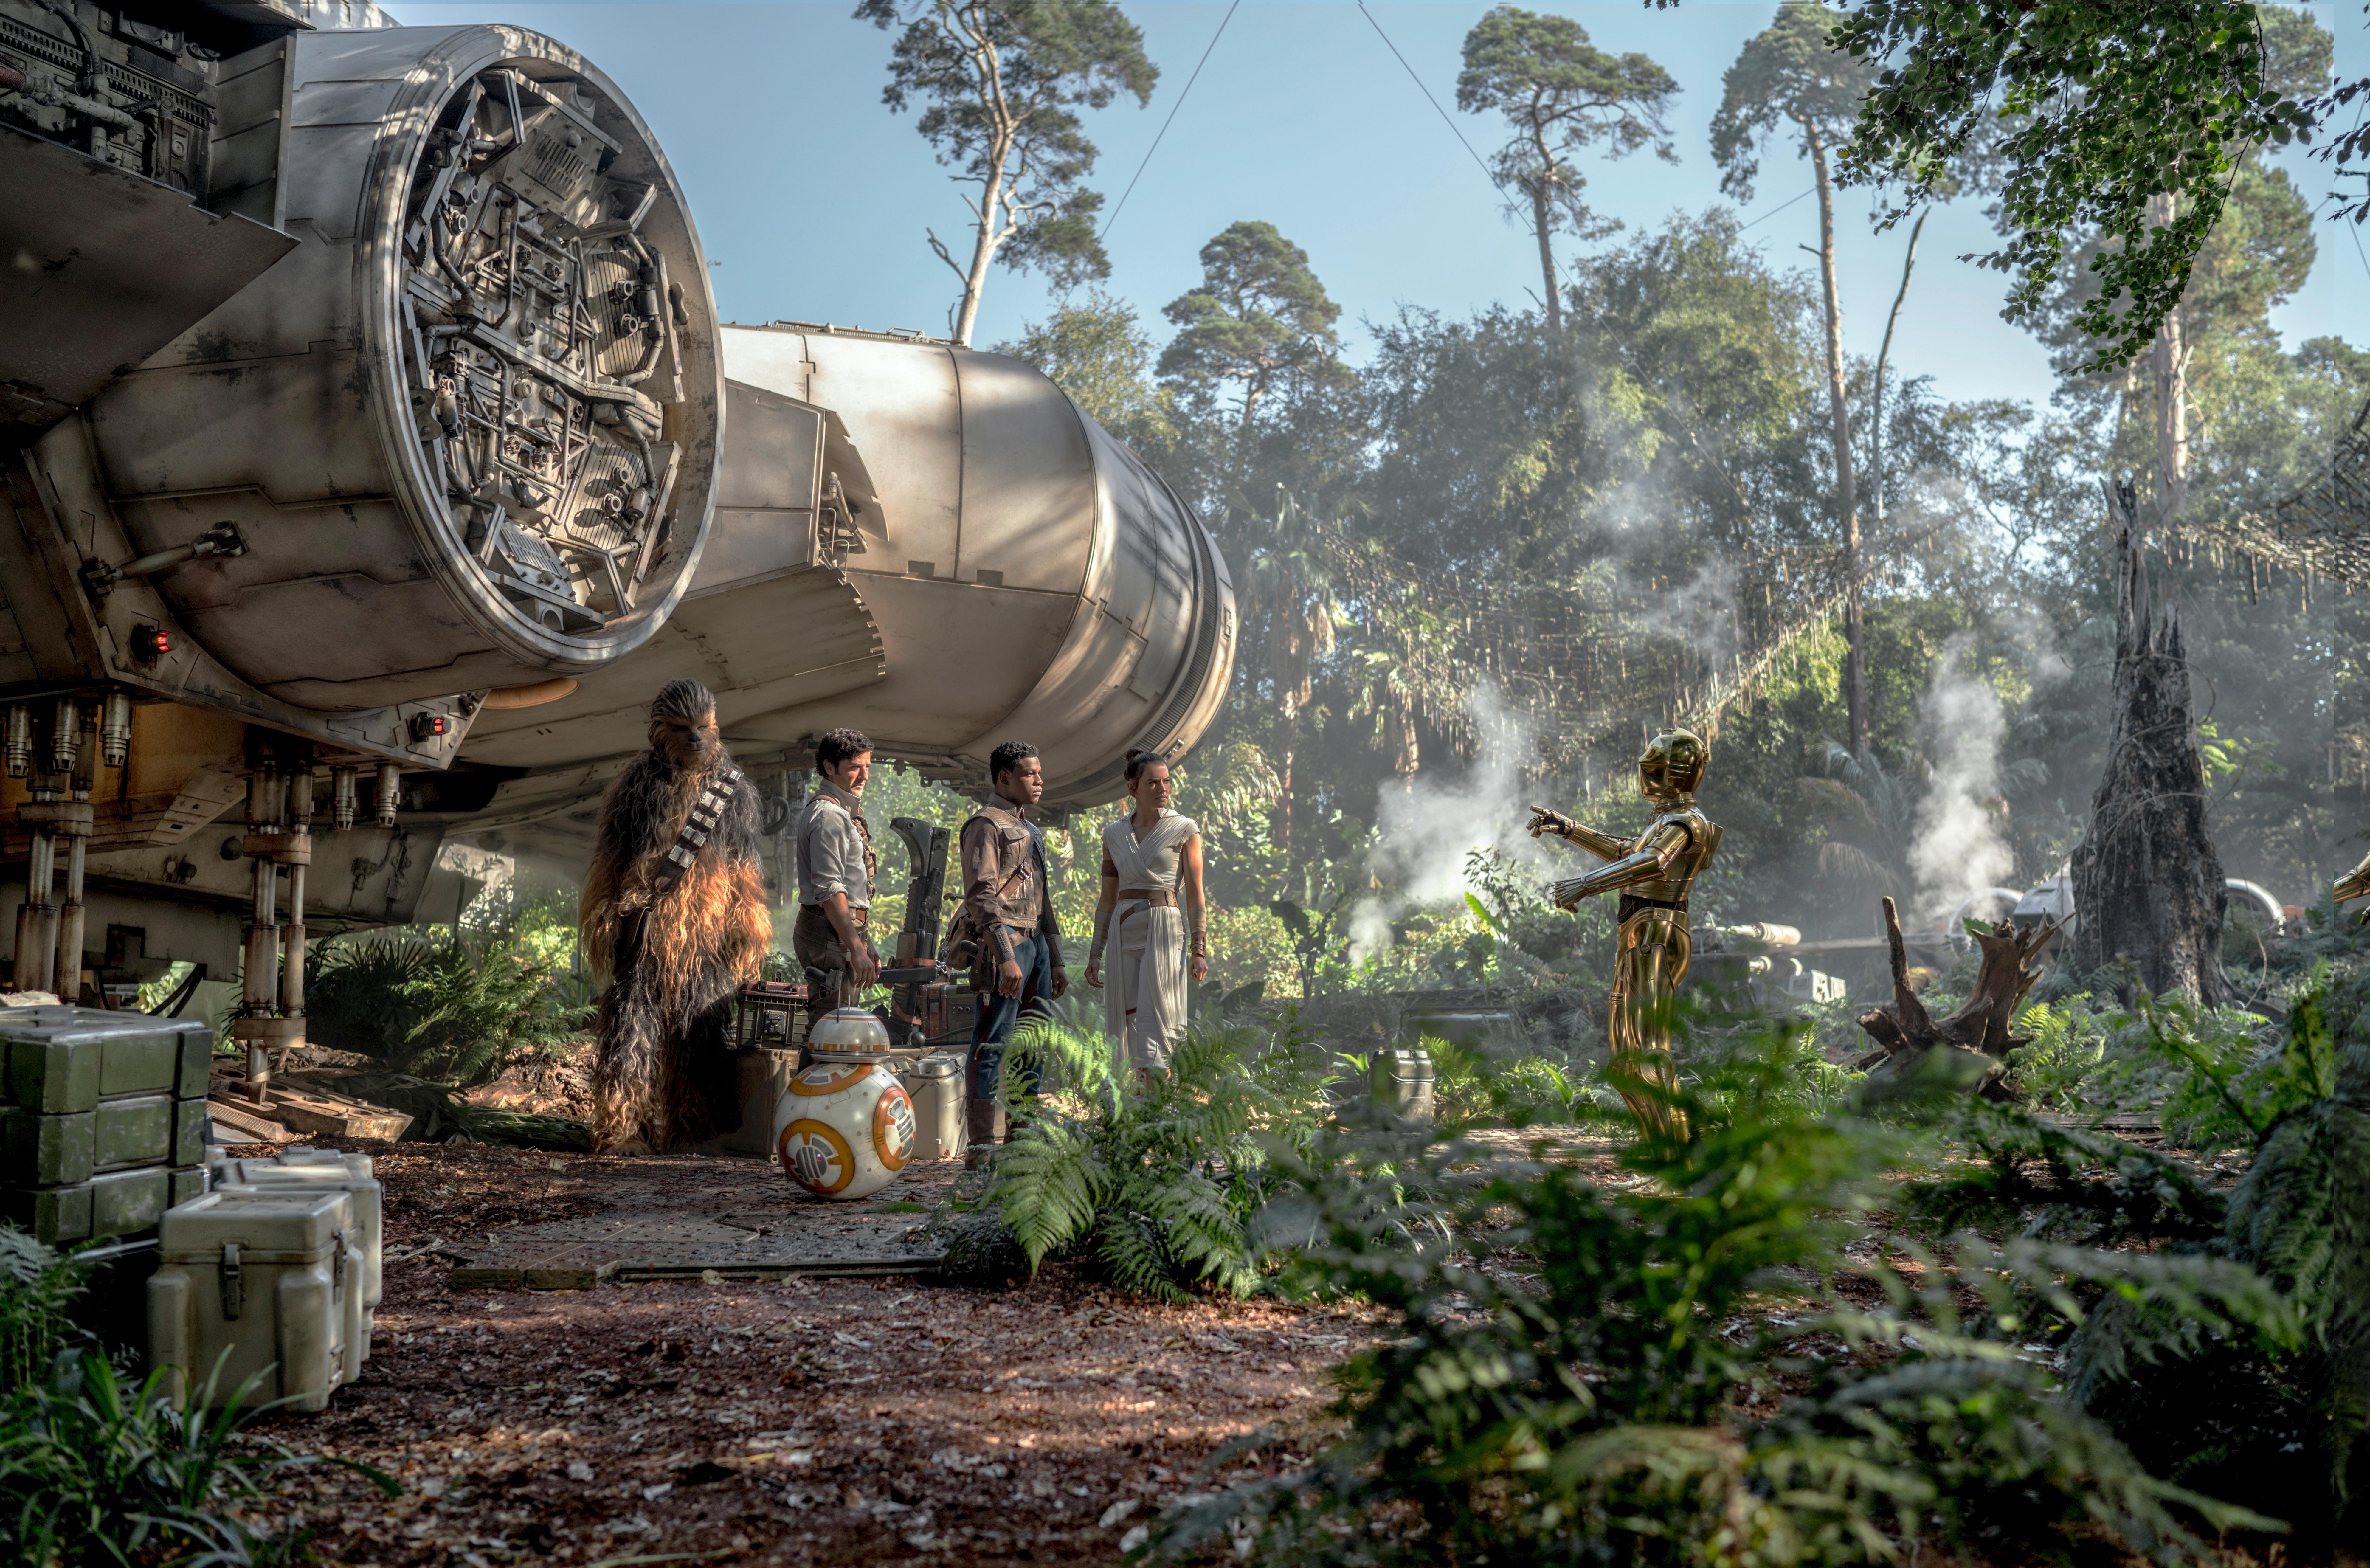 Chewbacca (Joonas Suotamo), Poe (Oscar Isaac), Finn (John Boyega), Rey (Daisy Ridley) and C-3PO (Anthony Daniels) in Star Wars: The Rise of Skywalker